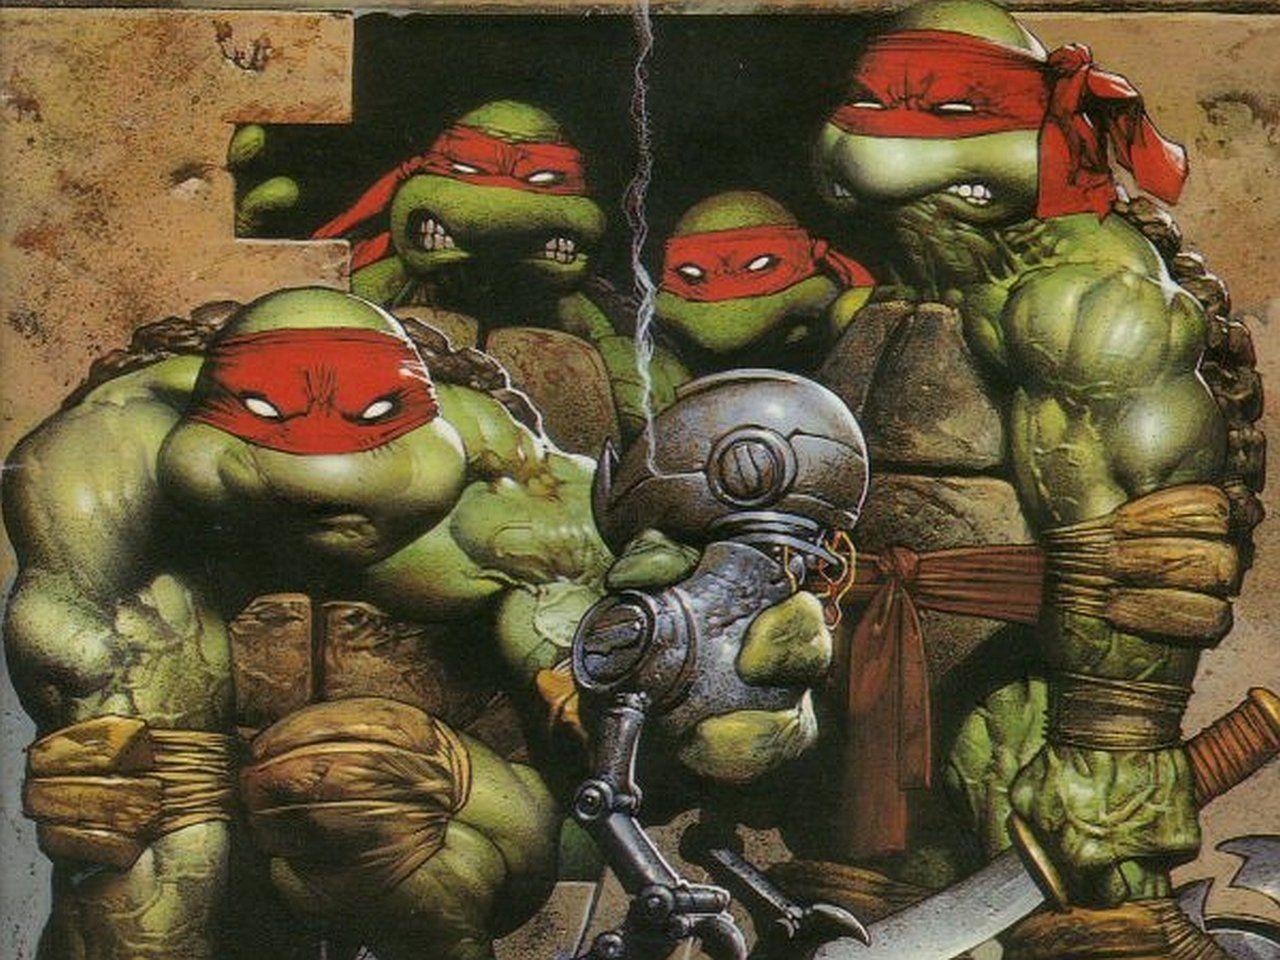 Ninja Turtles 2 Wallpapers Top Free Ninja Turtles 2 Backgrounds